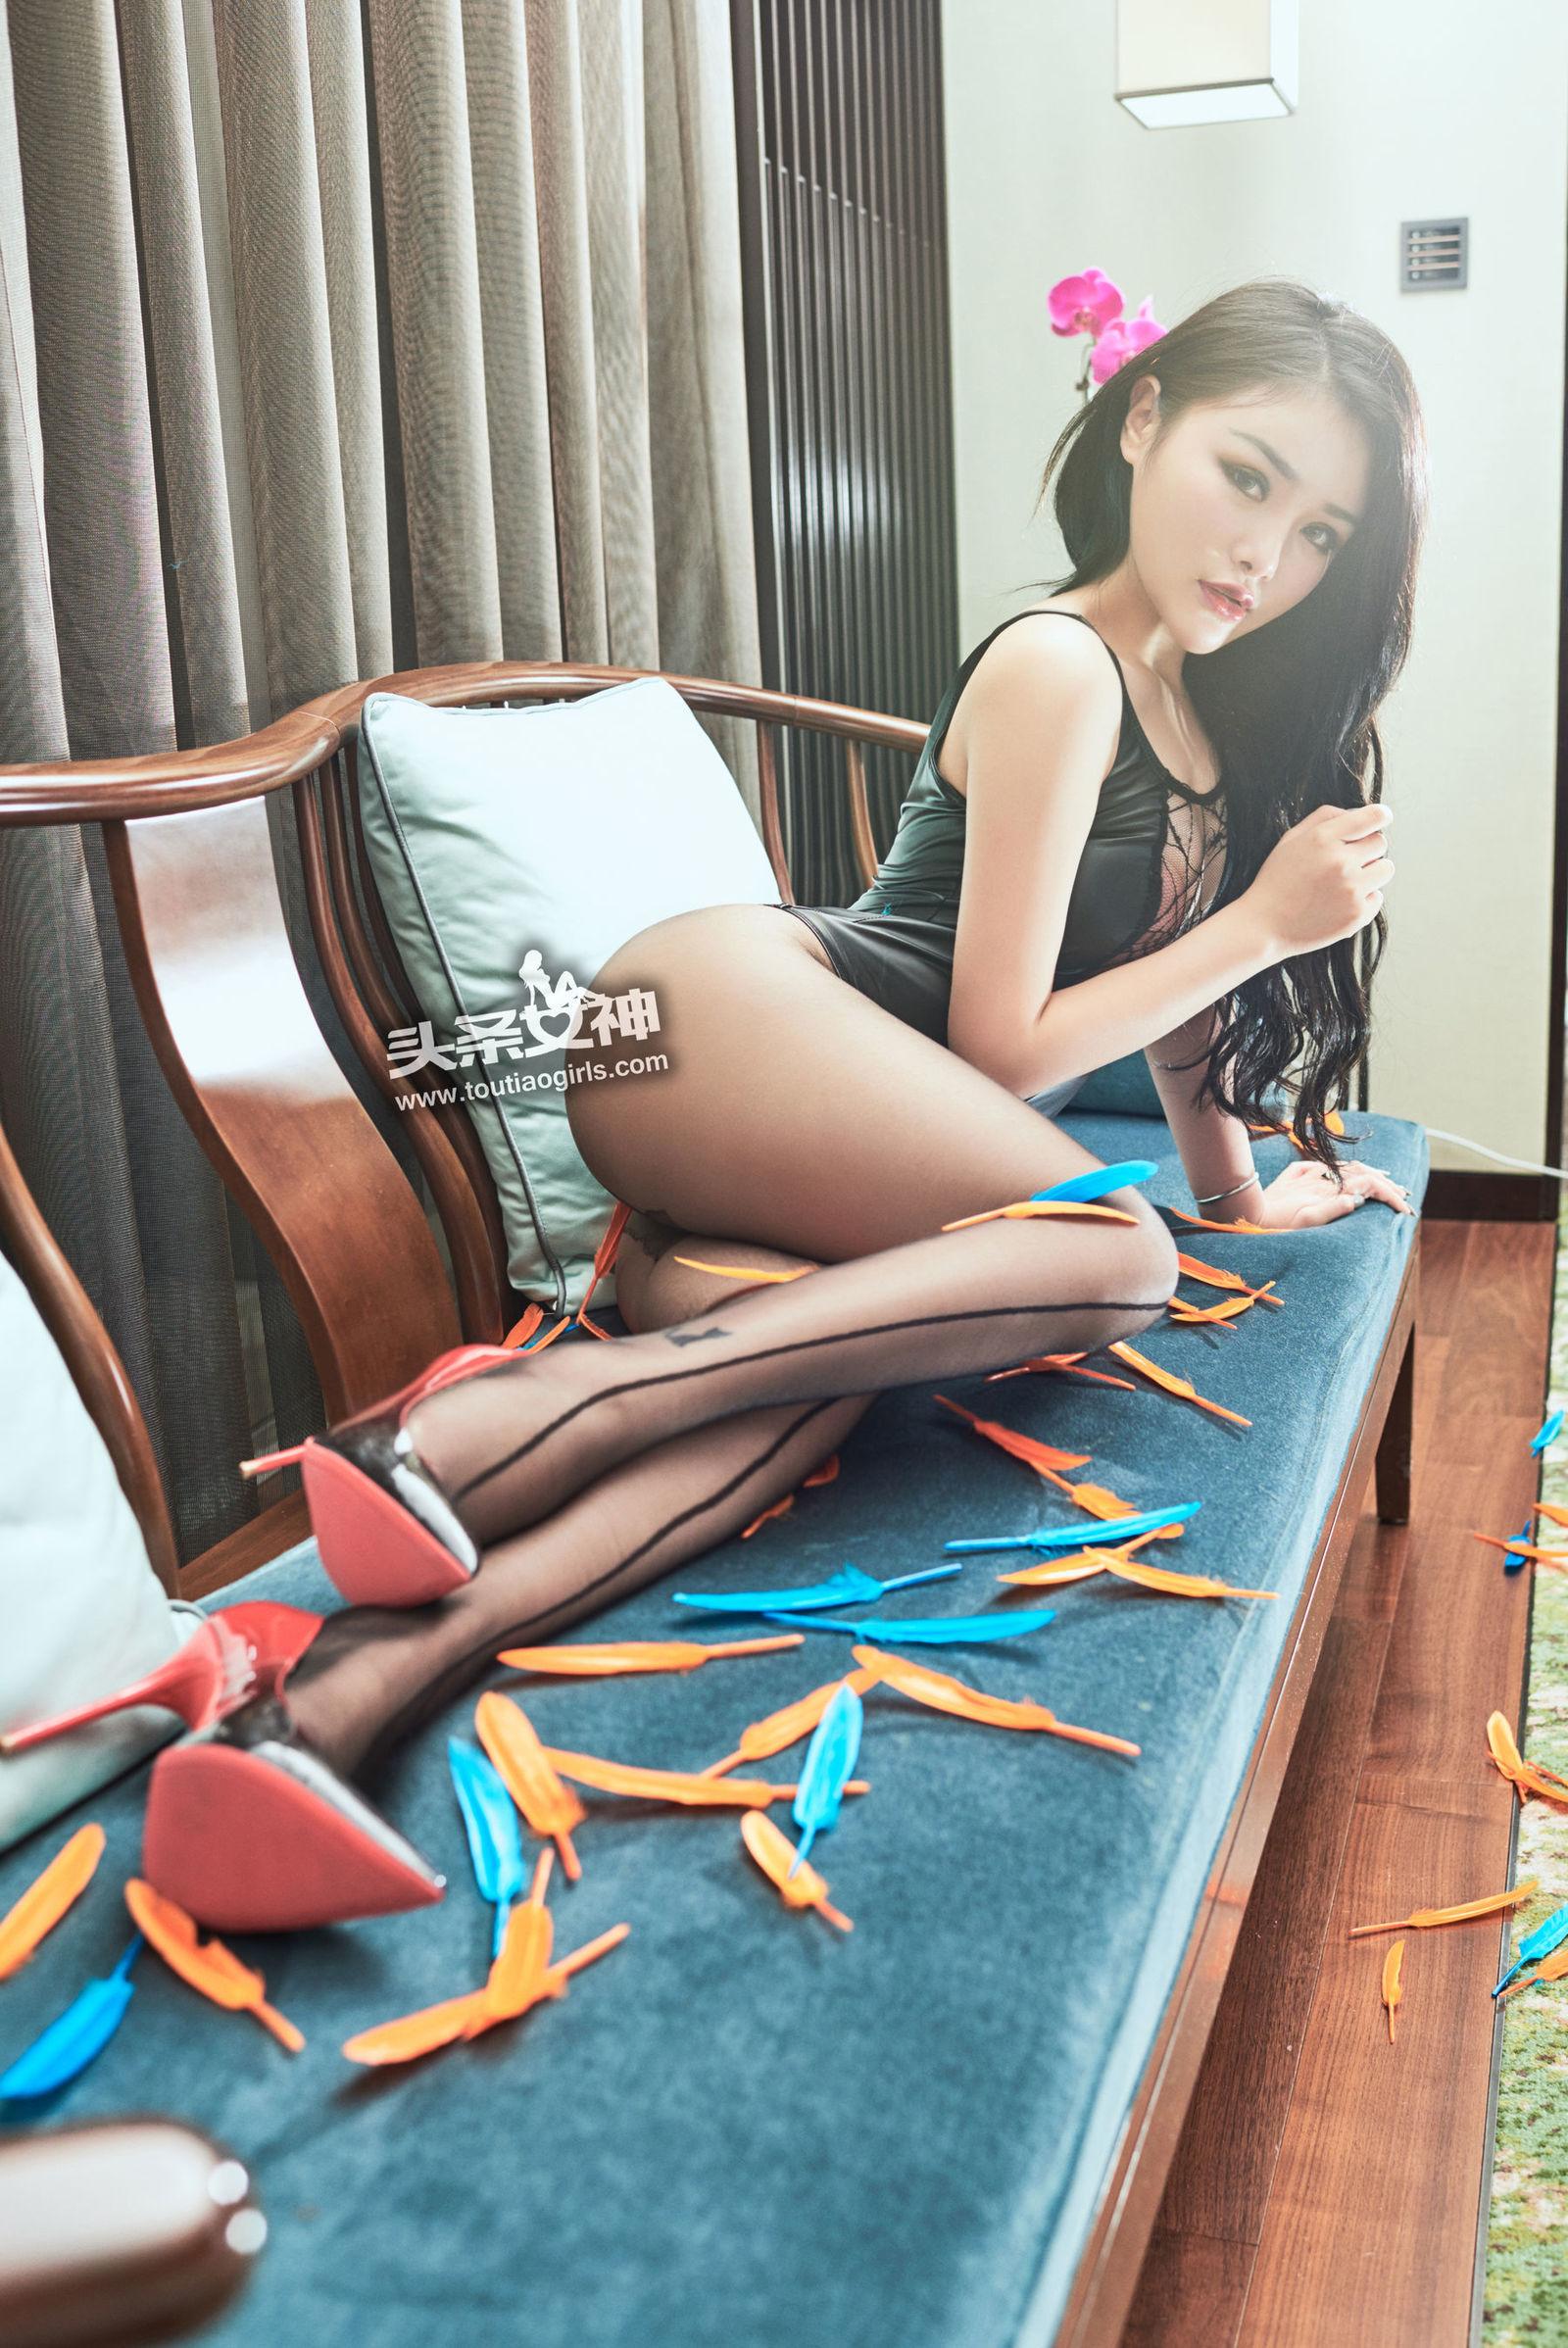 [Toutiaogirls头条女神] 陈宇曦 - 黑丝湿乐园 [24P]